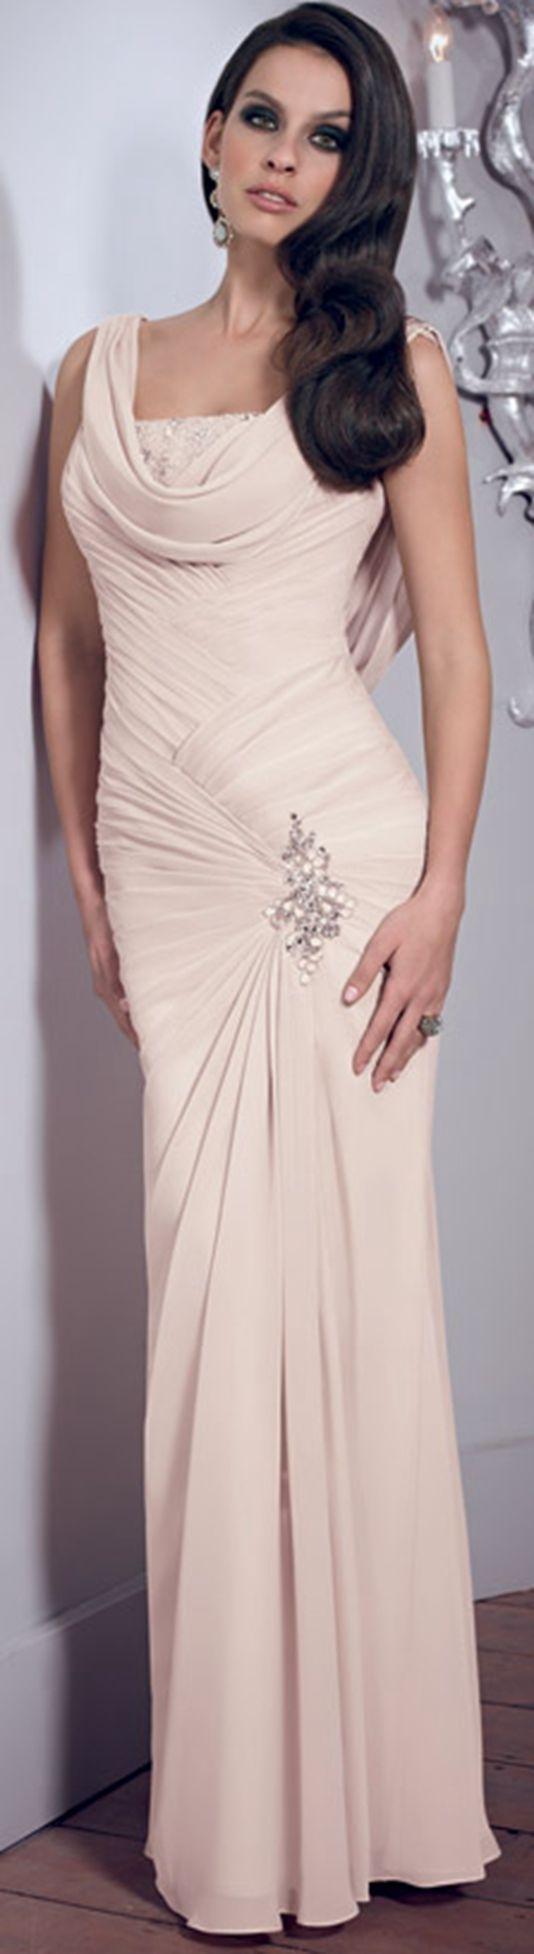 Elegant Sheath/Column Straps Beading Buttons Ruching Floor-length Chiffon Mother of the Bride Dresses